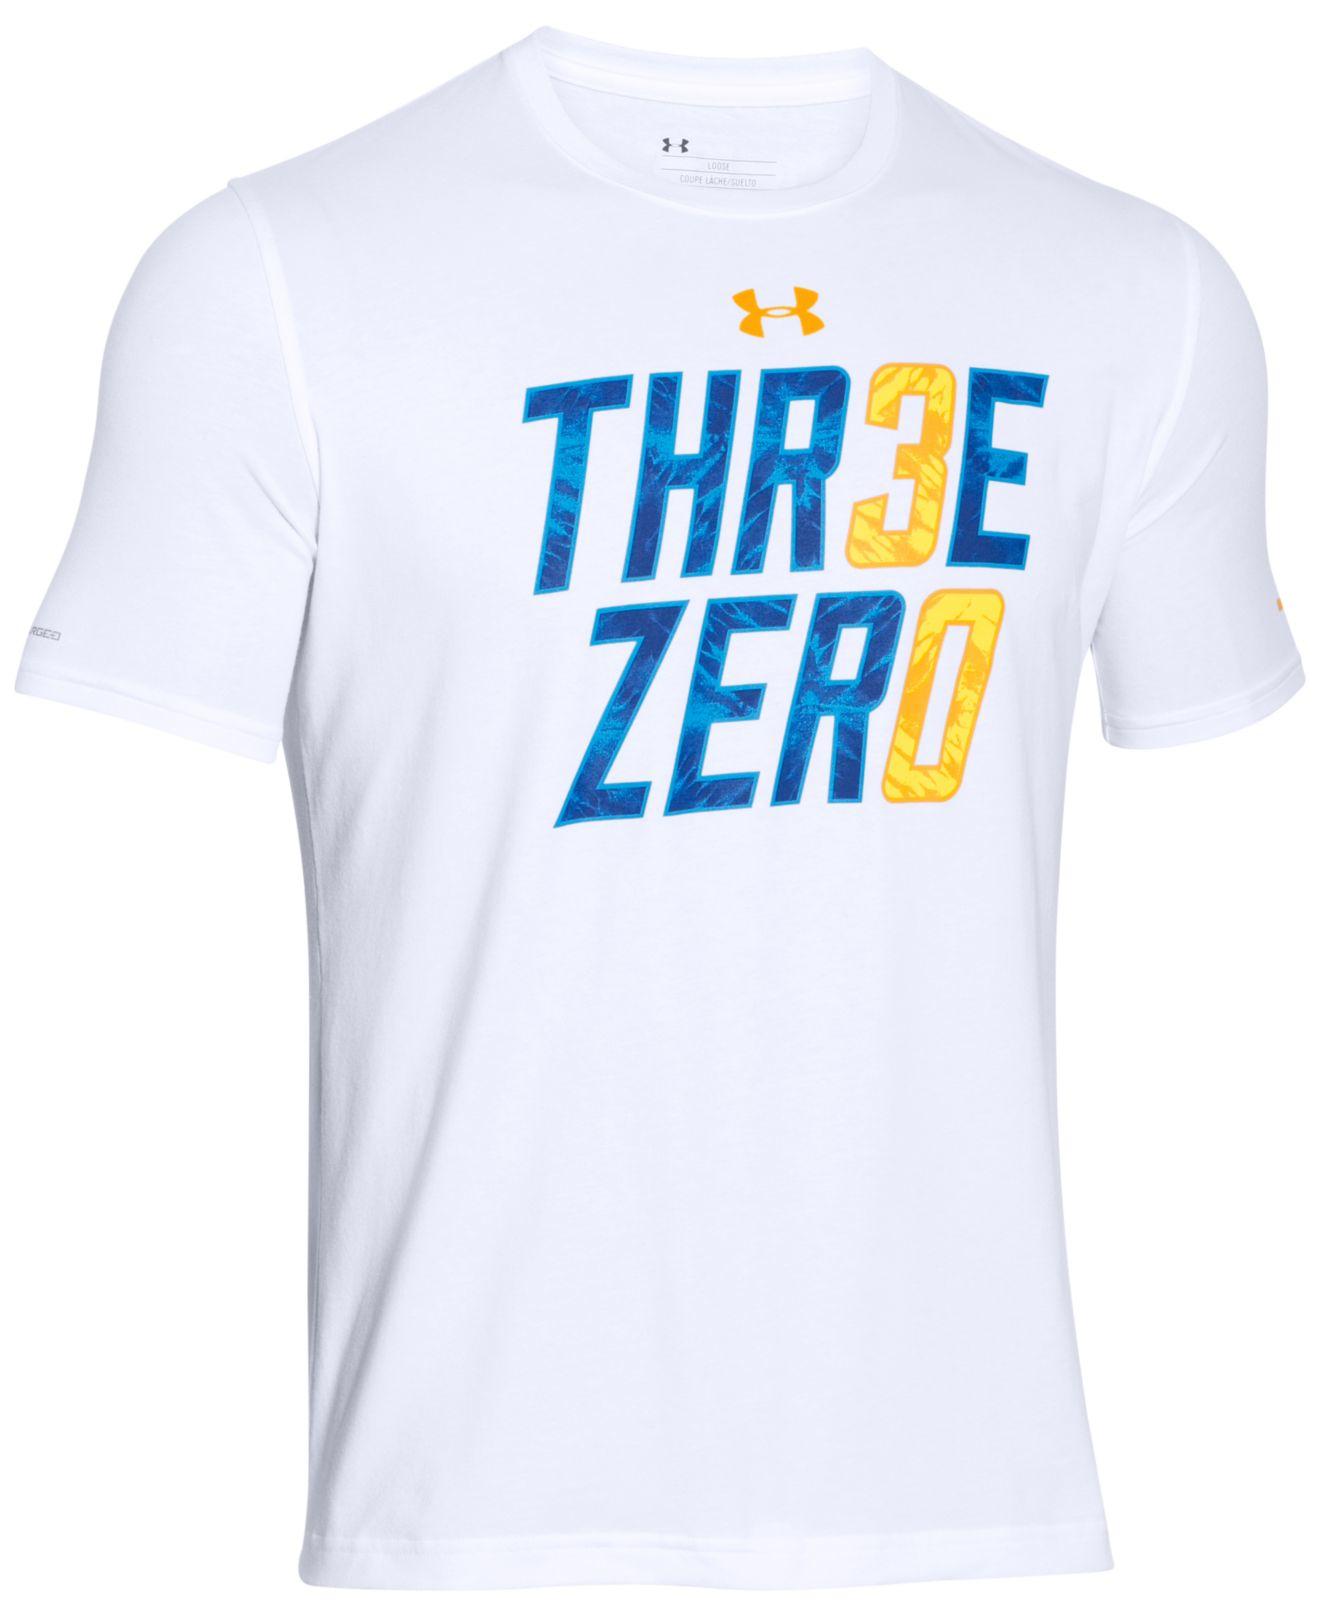 Stephen Curry Under Armour Shirt T Shirt Design Database